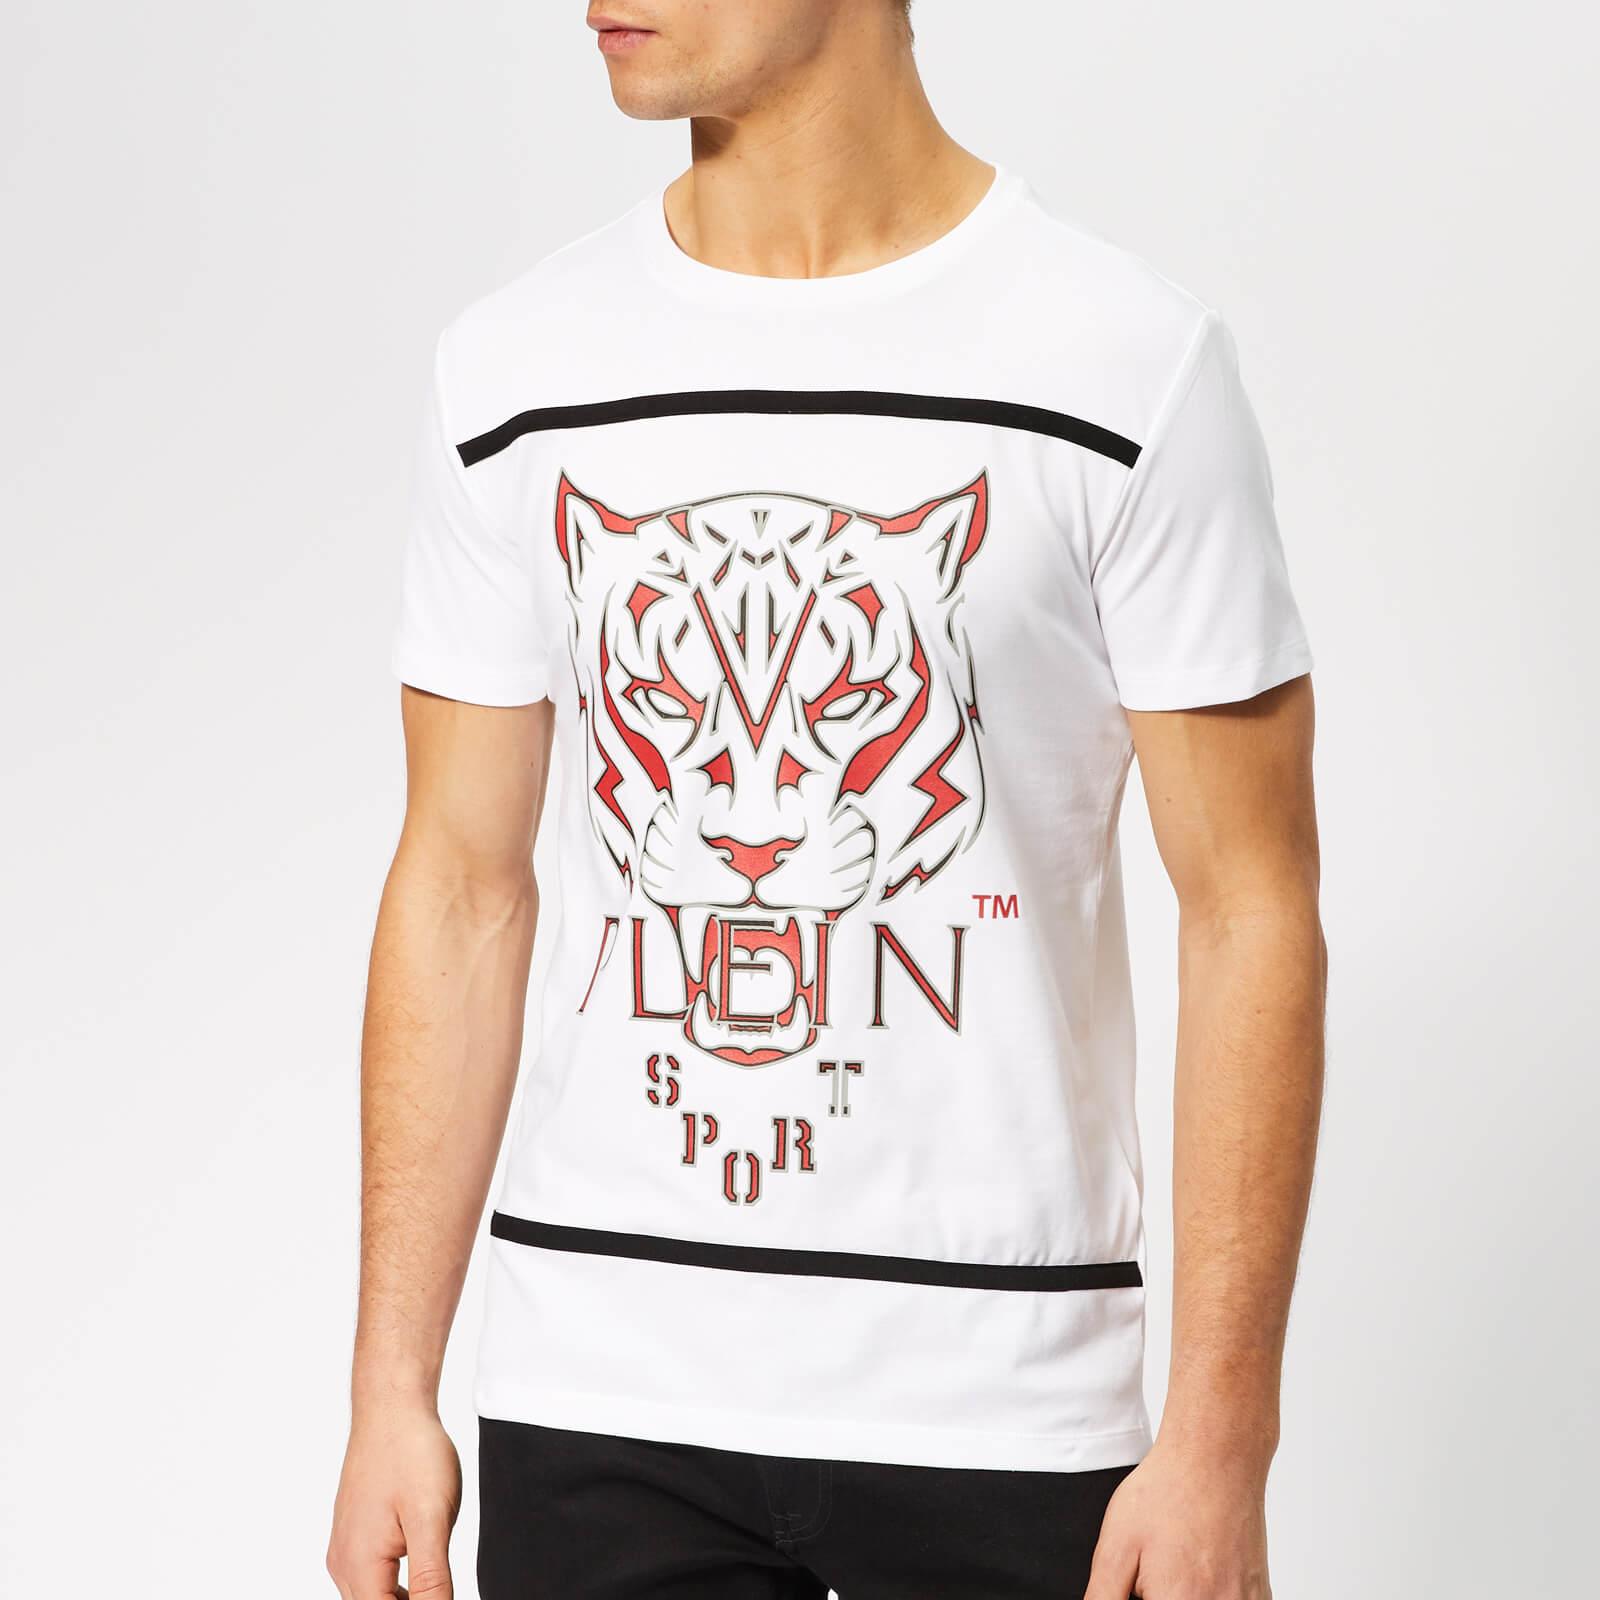 Plein Sport Men's Round Neck Tiger T-Shirt - White/Grey - M - White/Grey